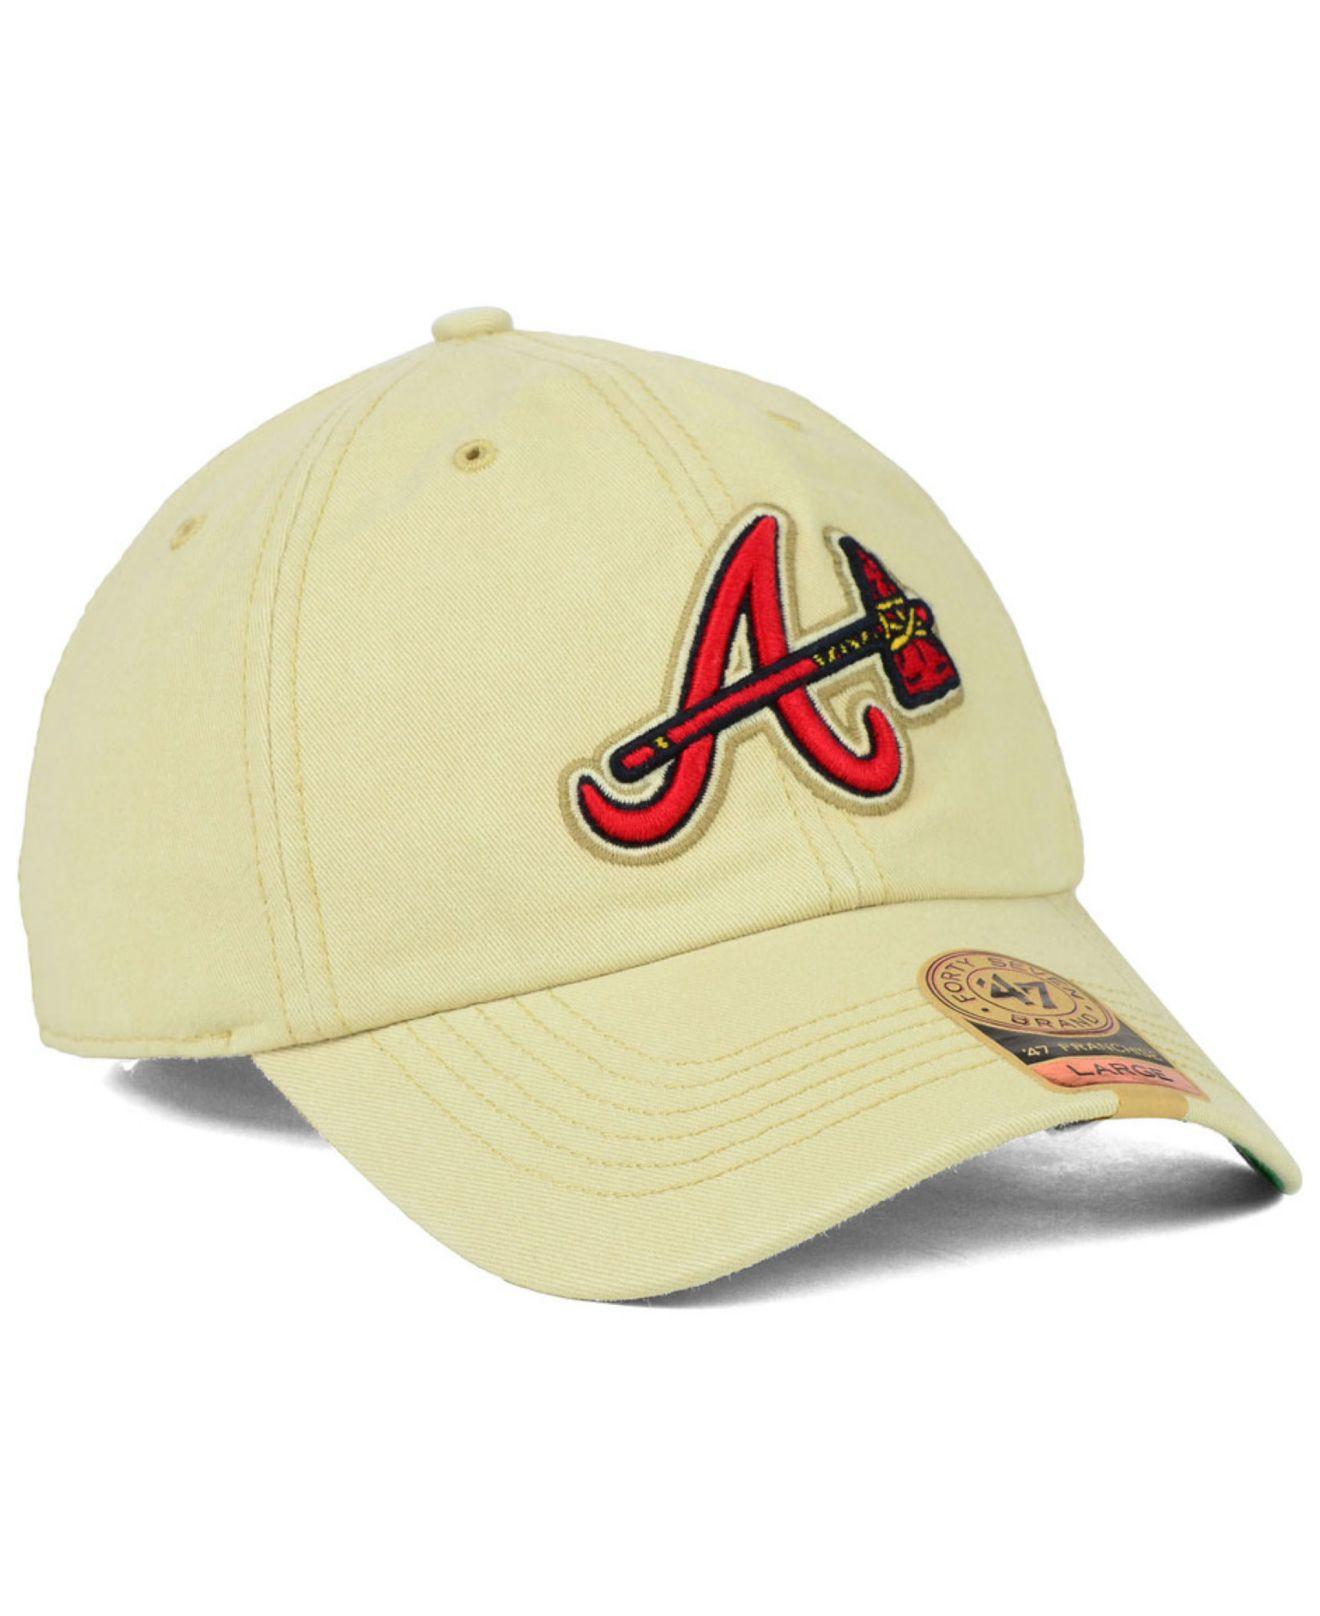 ... amazon lyst 47 brand atlanta braves lawrence franchise cap in natural  for men 1b3bd 0c162 e1cbf82a0eaa